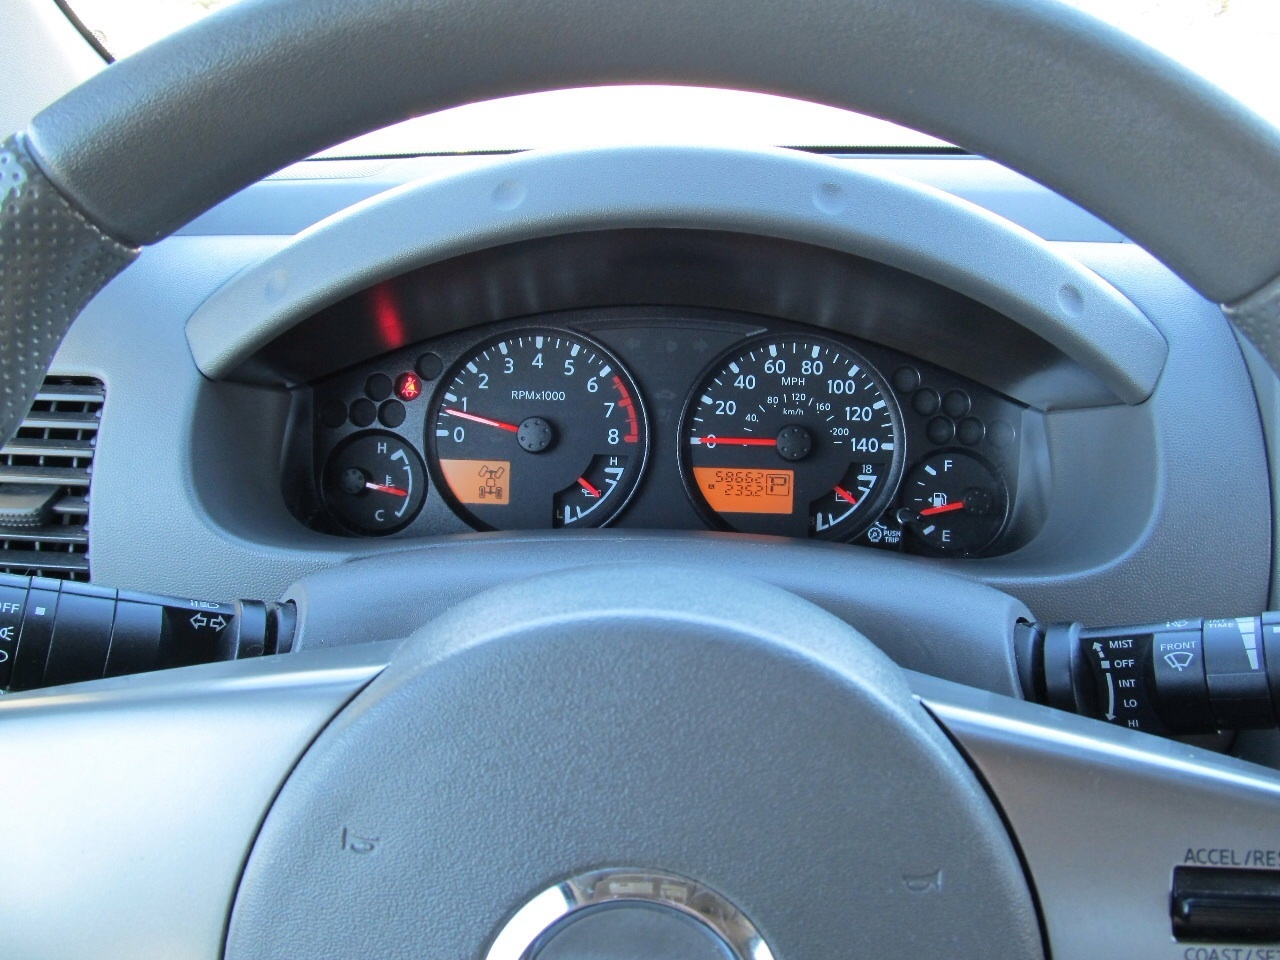 2010 Nissan Frontier Pictures Cargurus